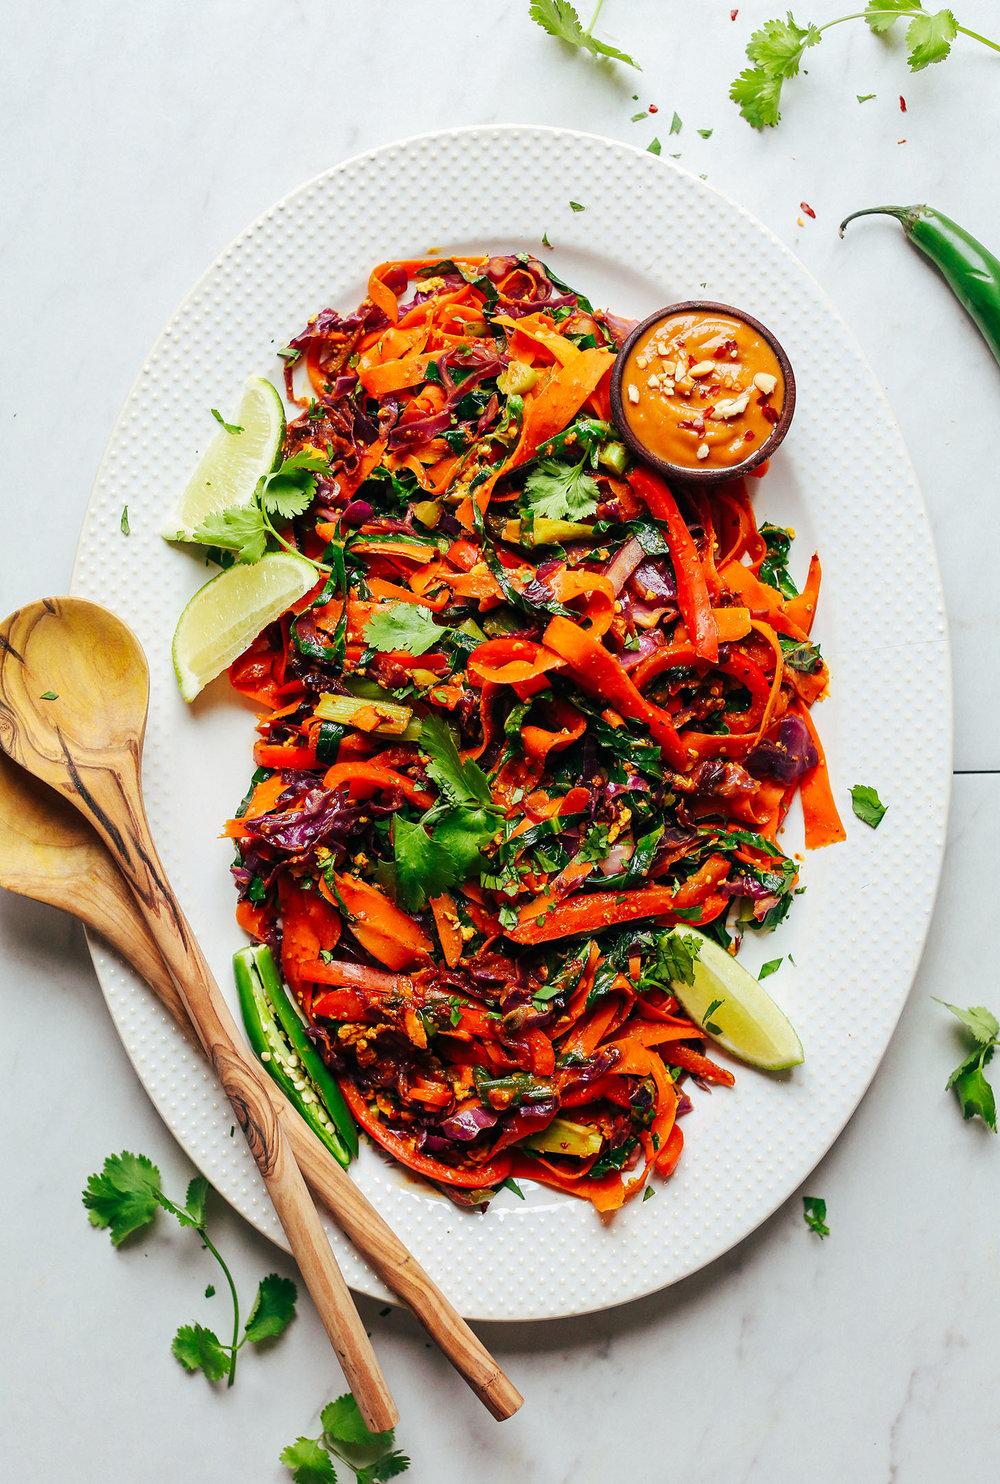 INCREDIBLE-Noodle-Free-Pad-Thai-30-minutes-entirely-plantbased-SO-delicious-vegan-glutenfree-padthai-minimalistbaker-recipe.jpg